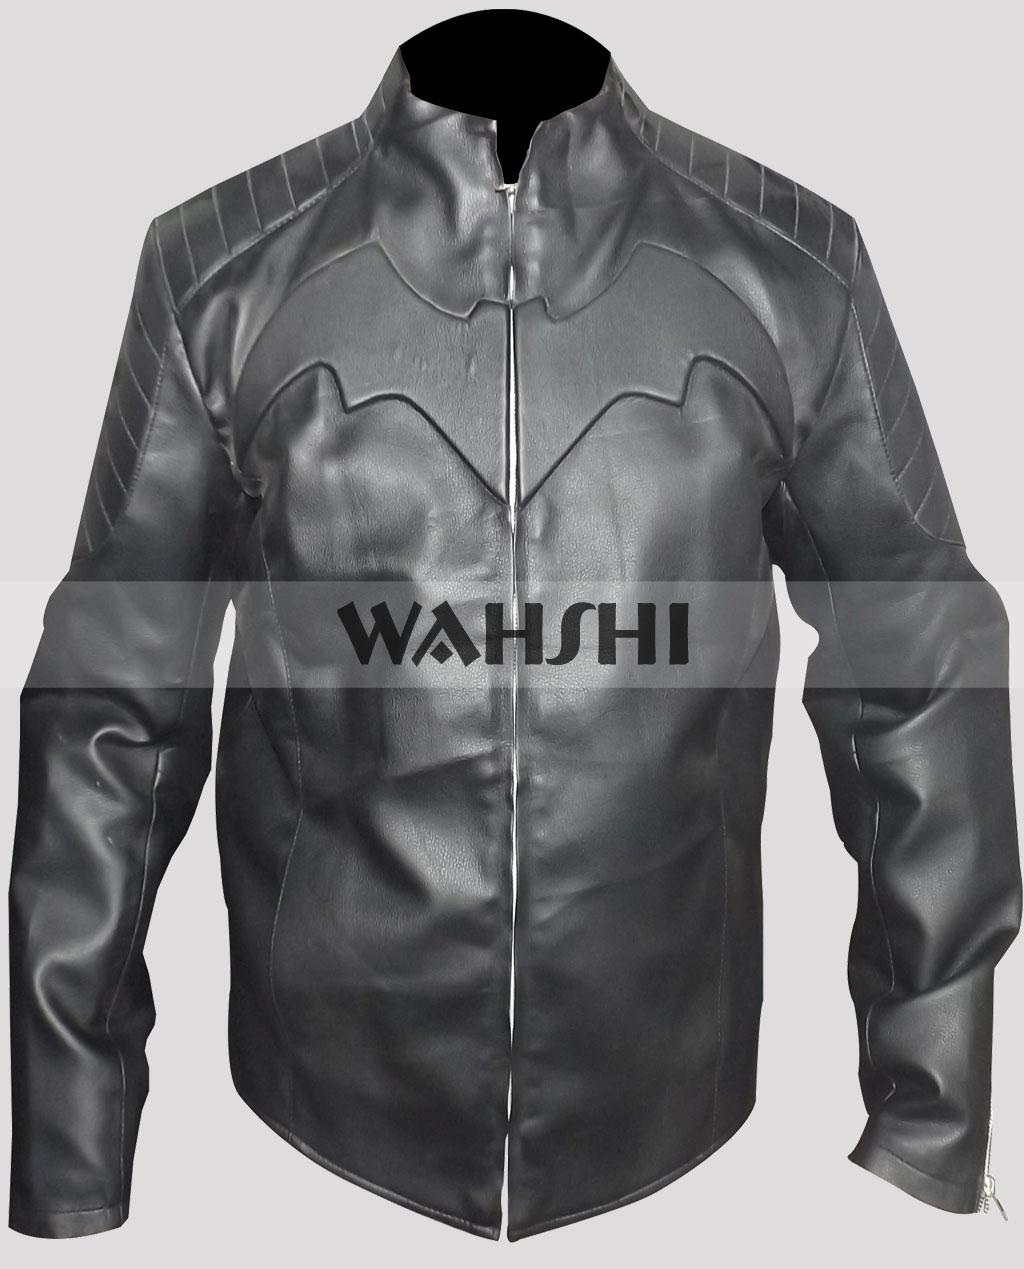 bikers-batman-begins-leather-jacket